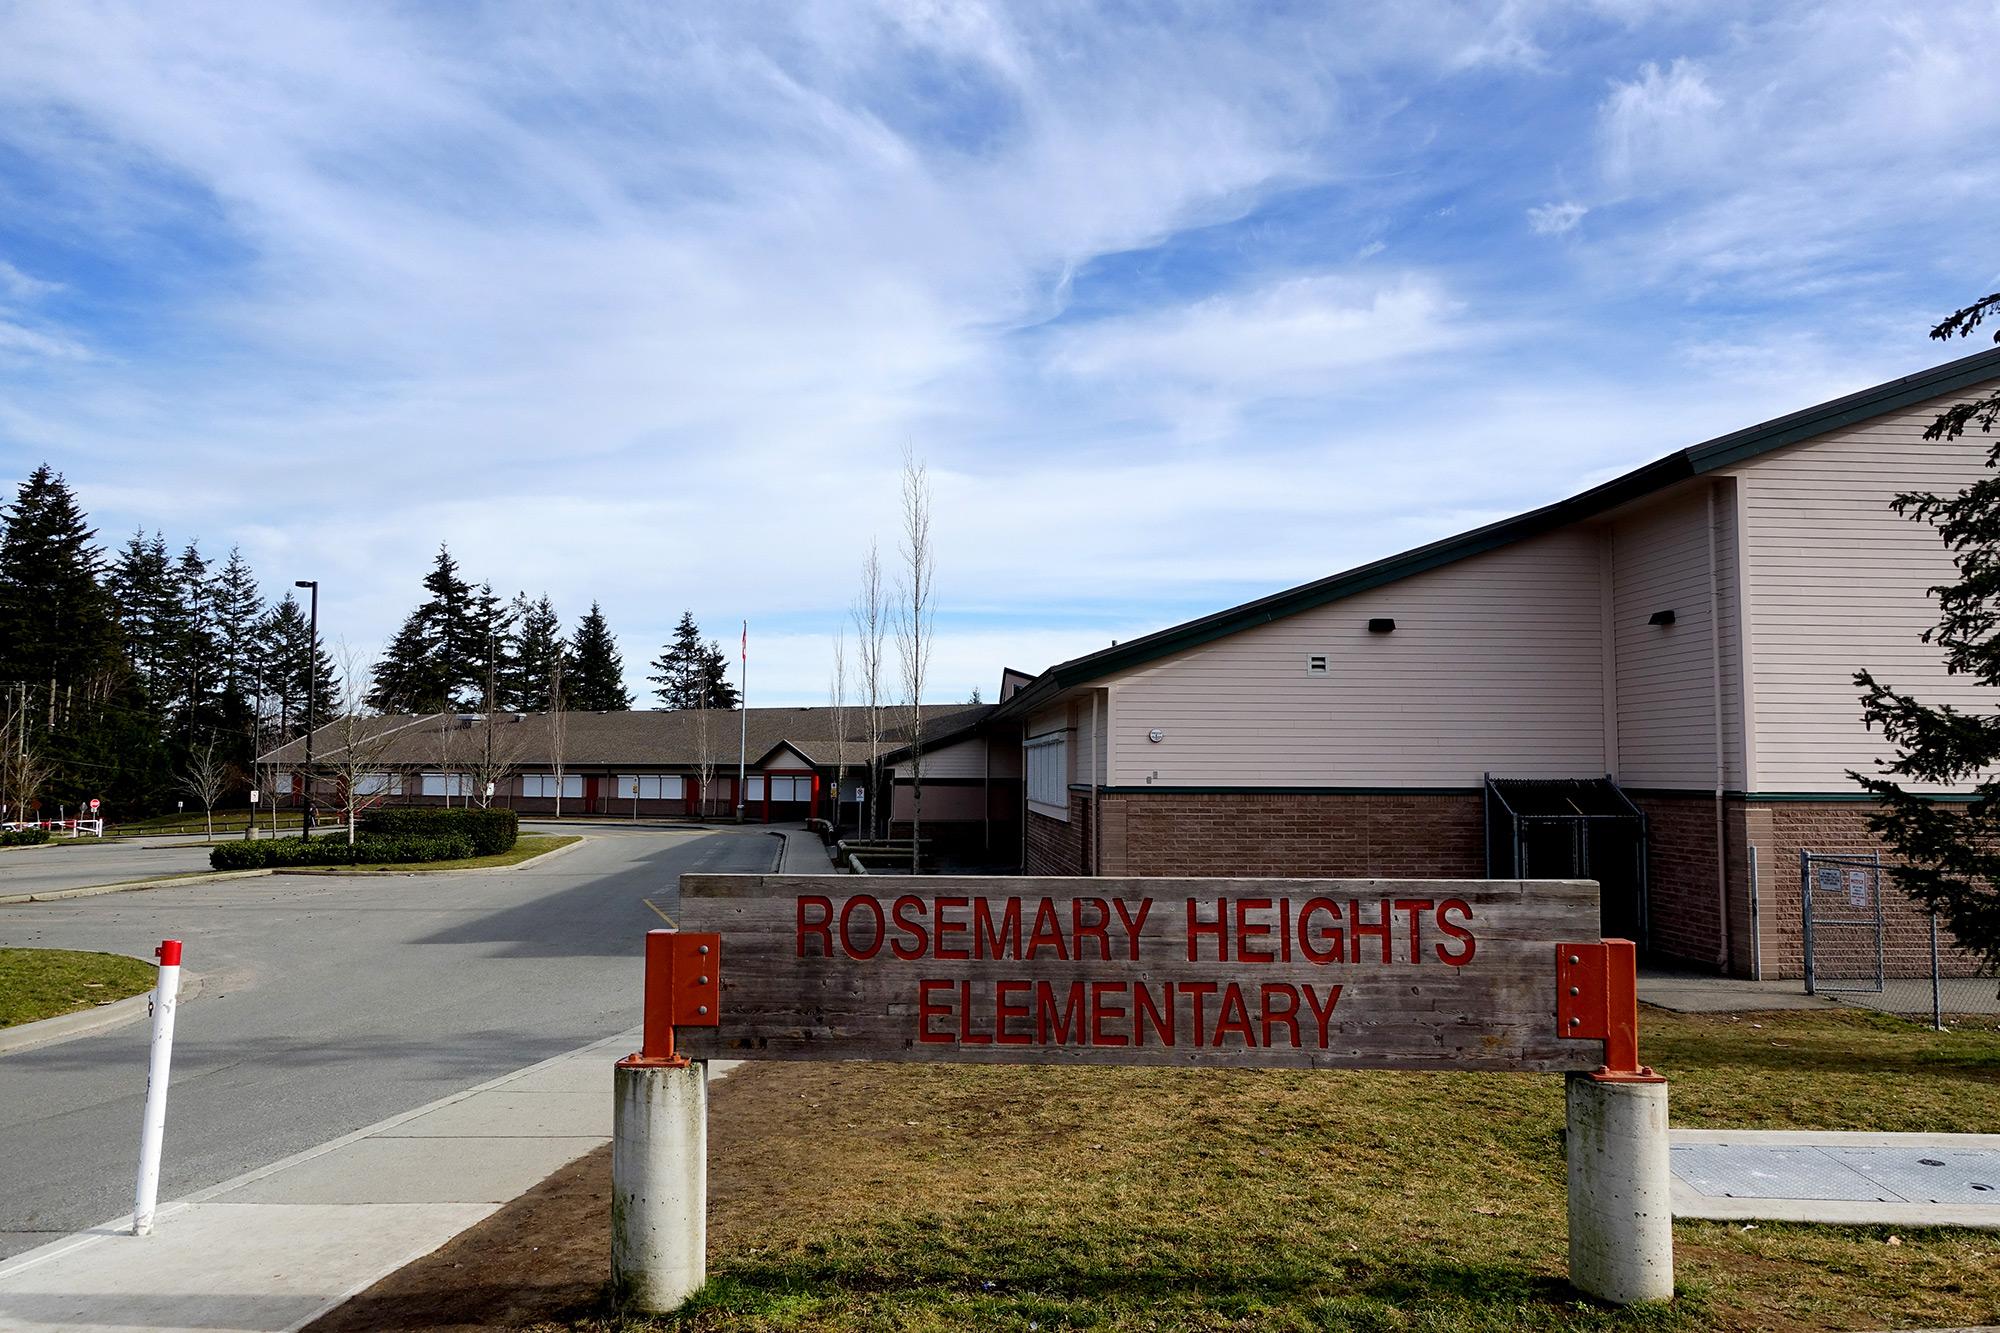 Rosemary Heights Elementary